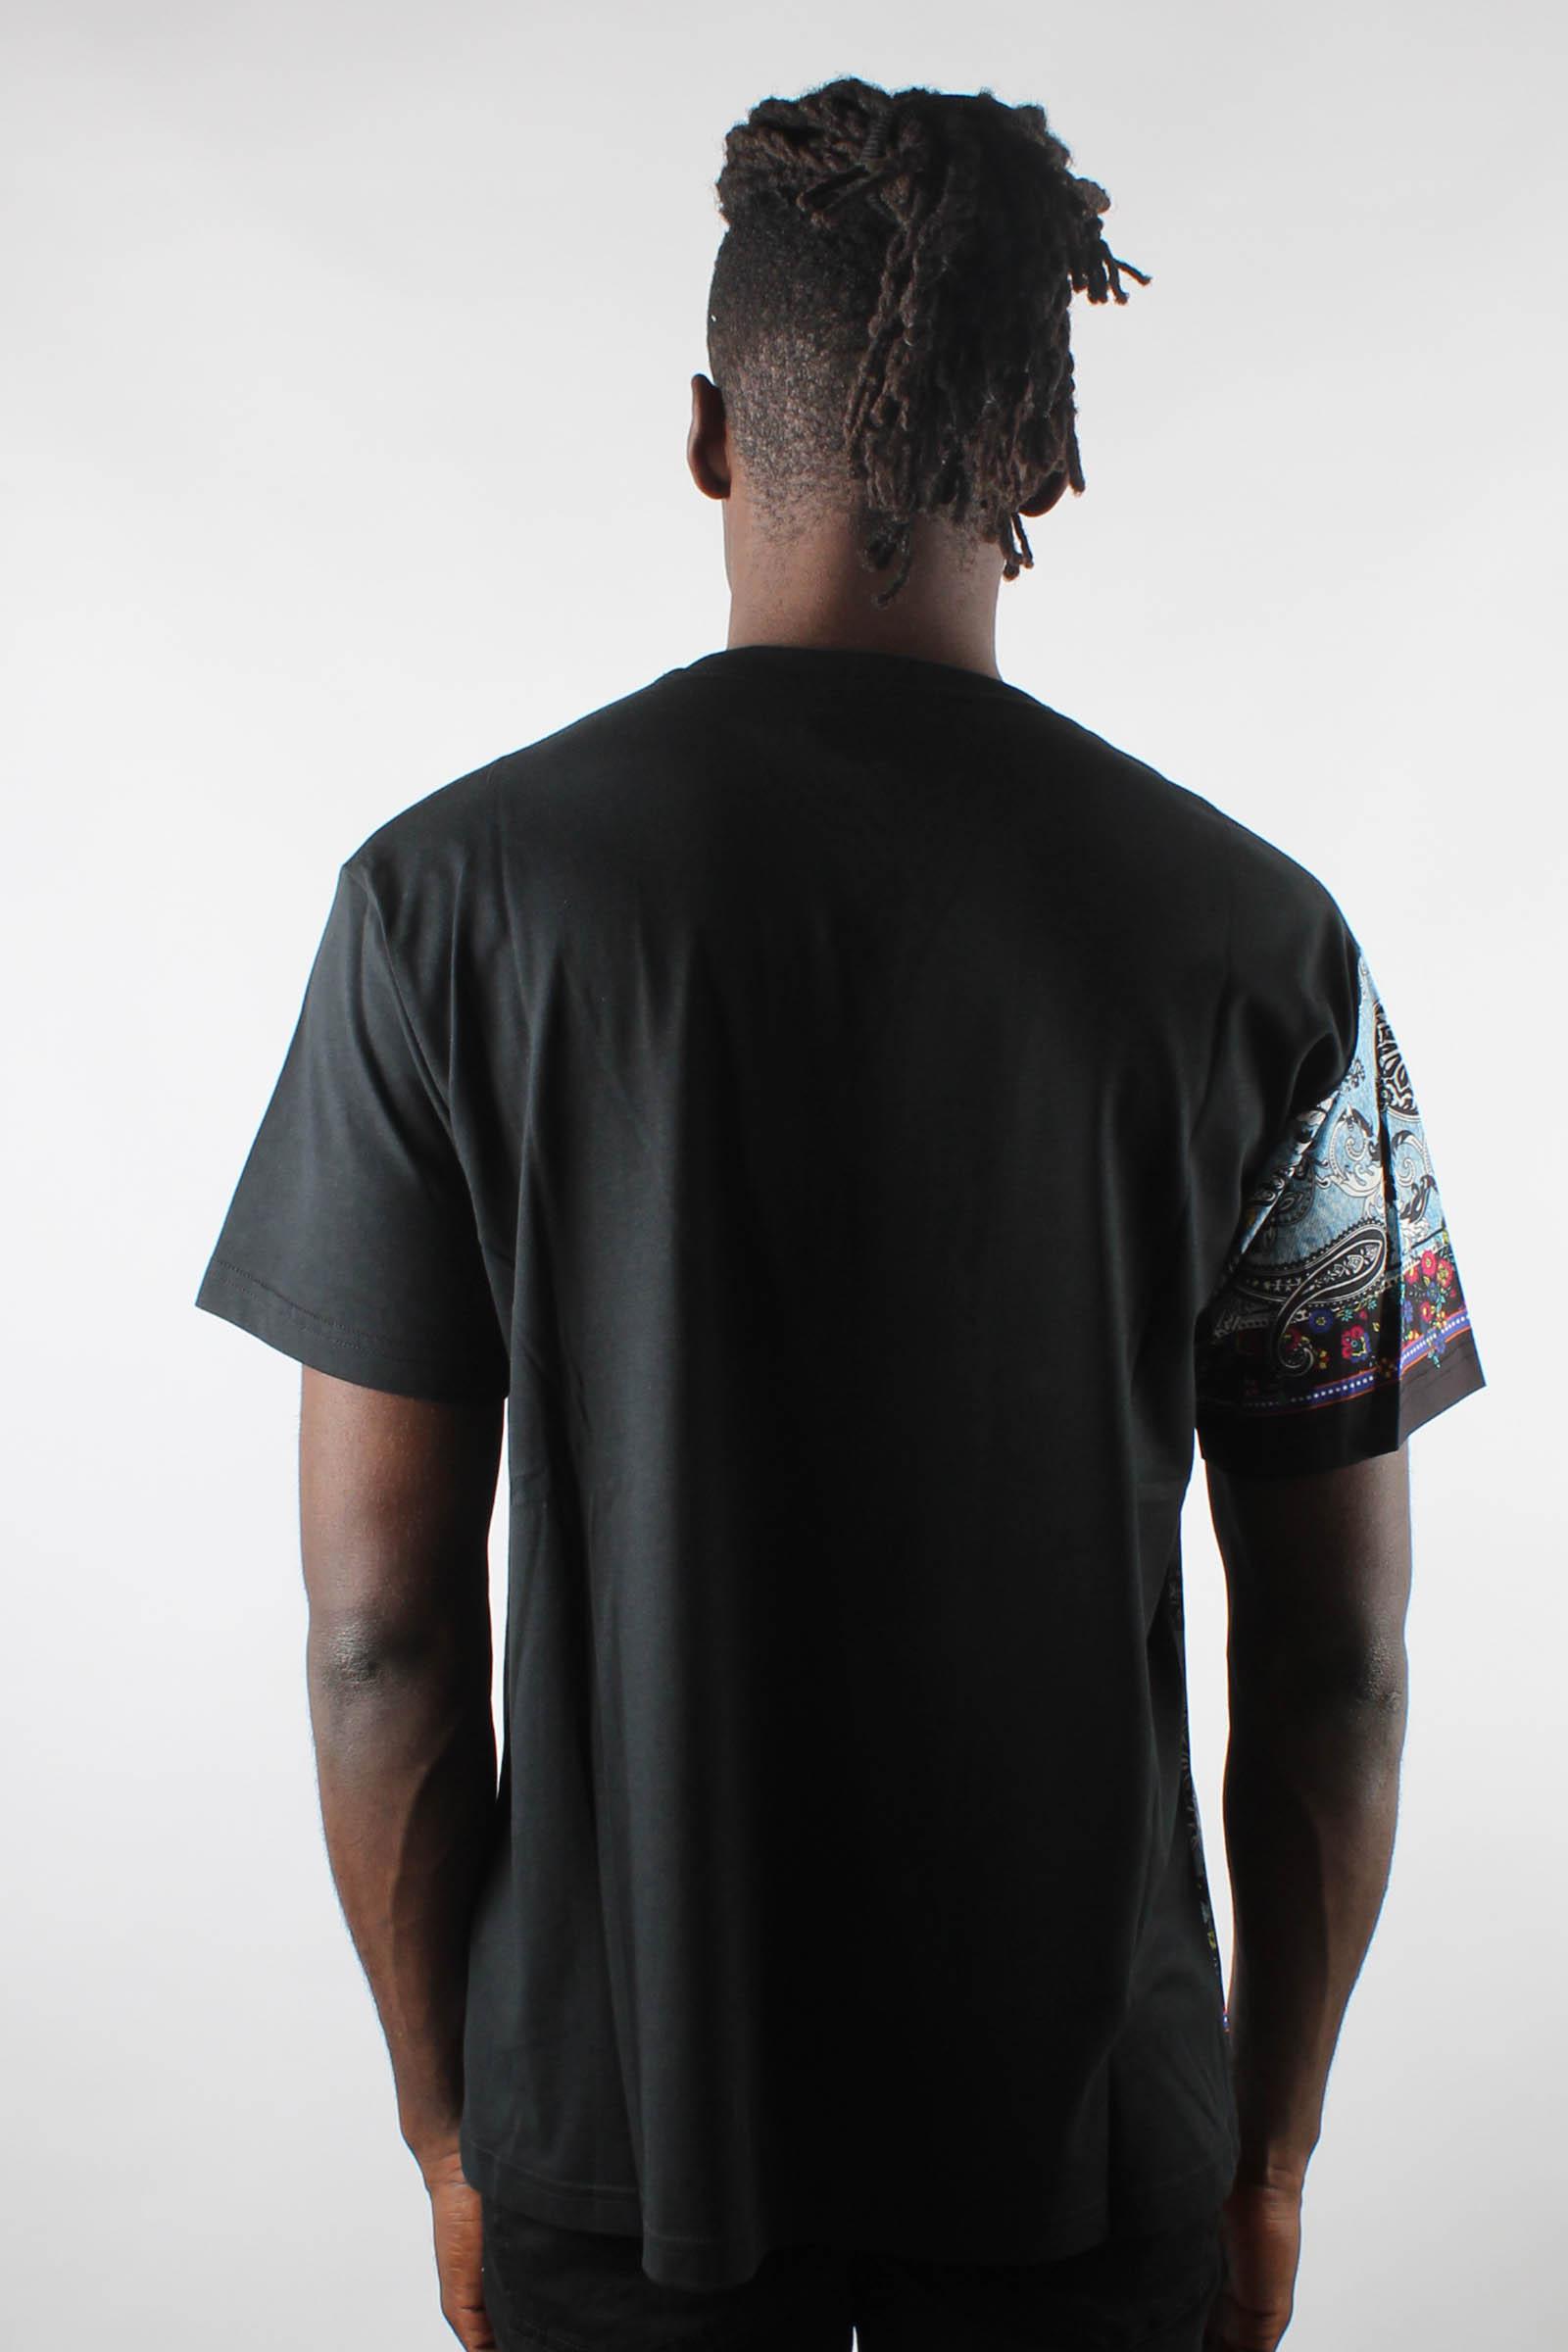 VERSACE JEANS | Shirt2 | B3GZA7R2 11620899